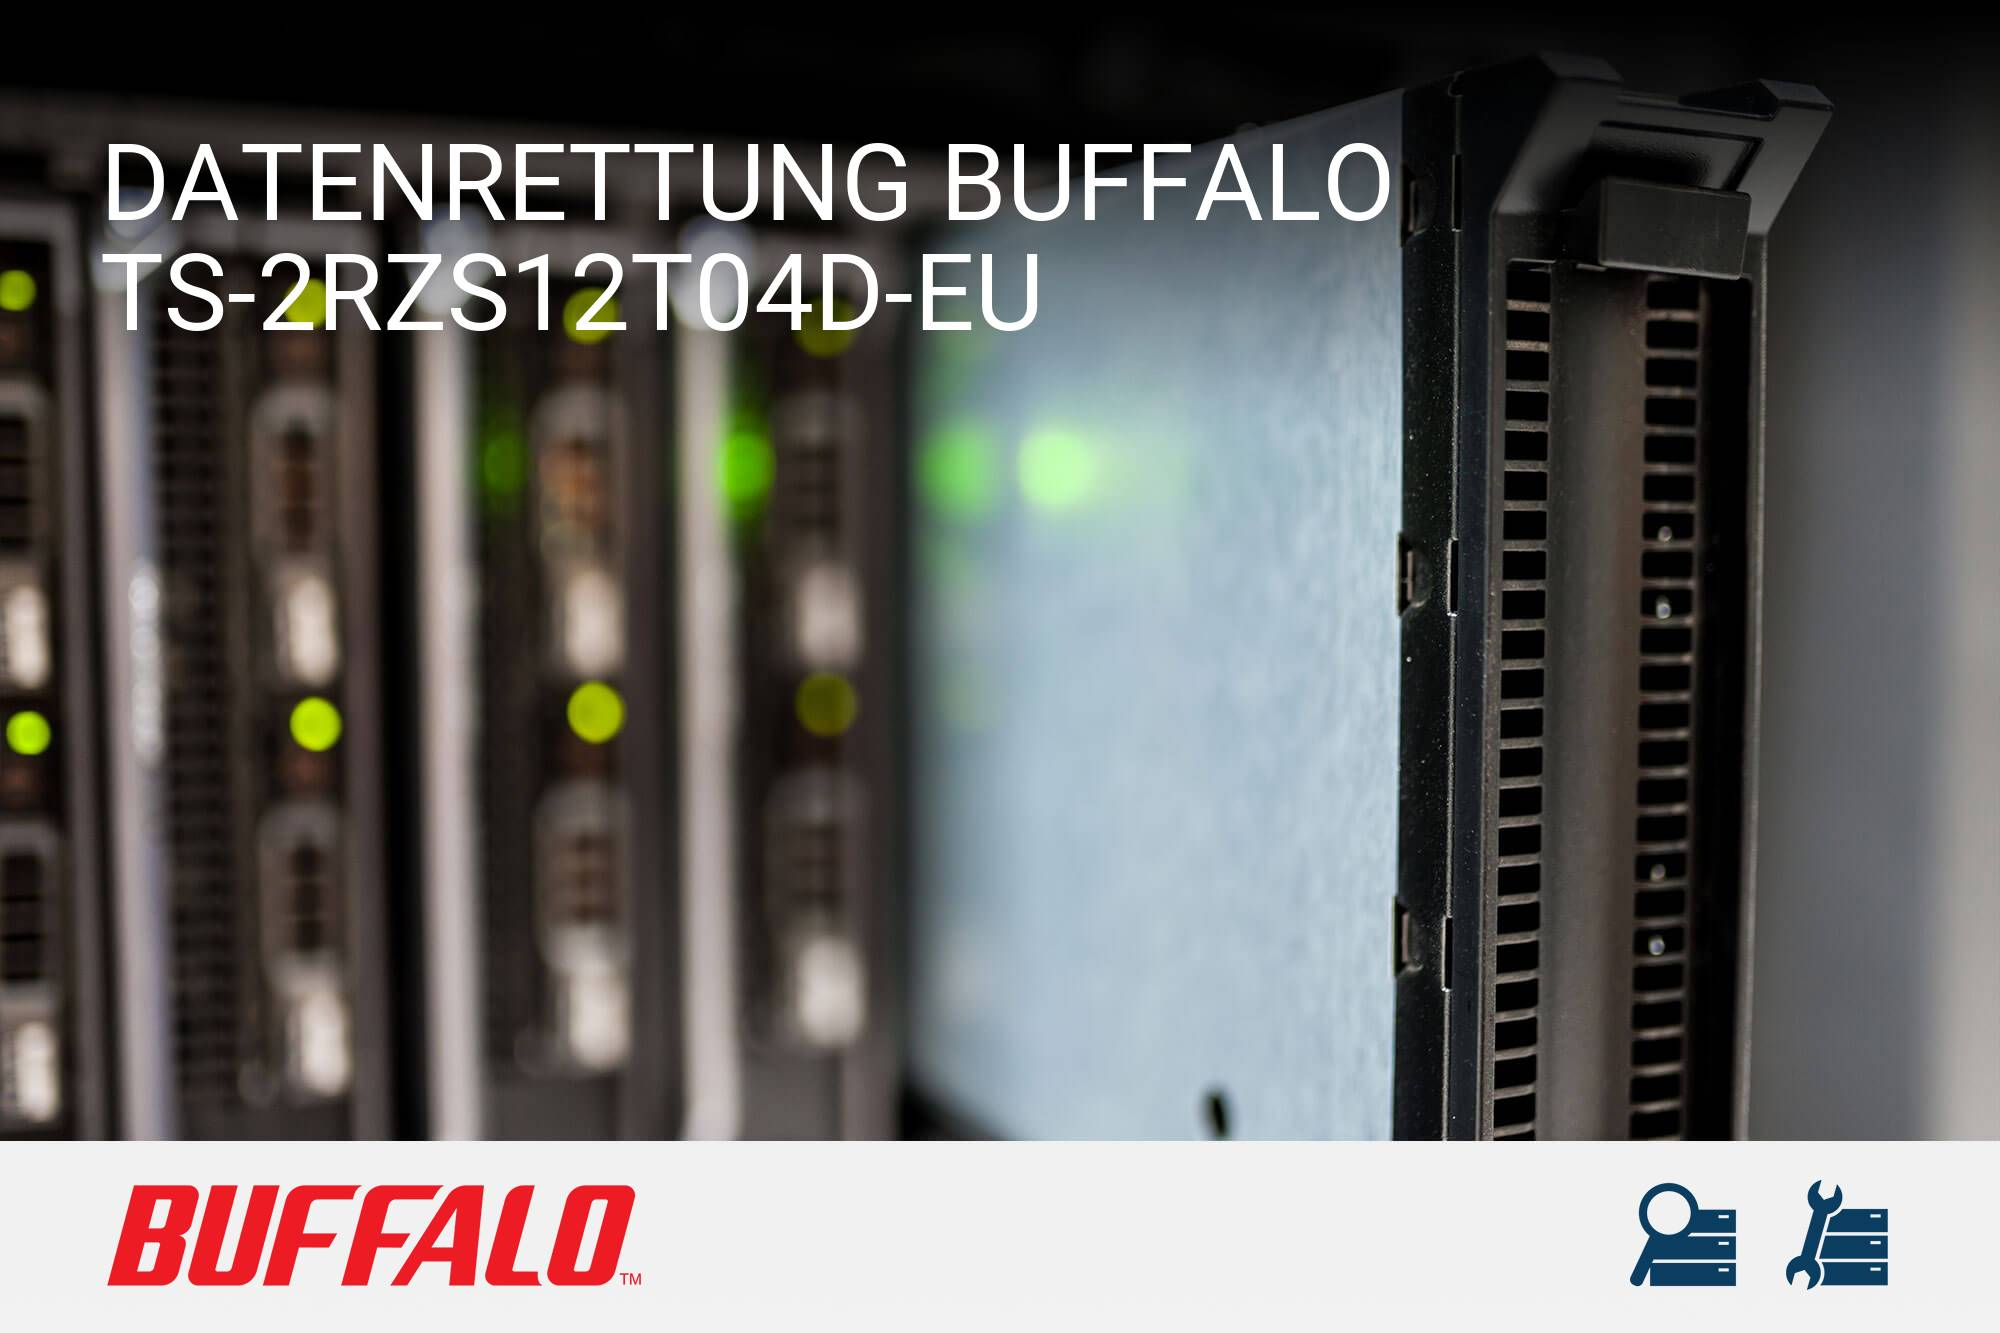 Buffalo TS-2RZS12T04D-EU